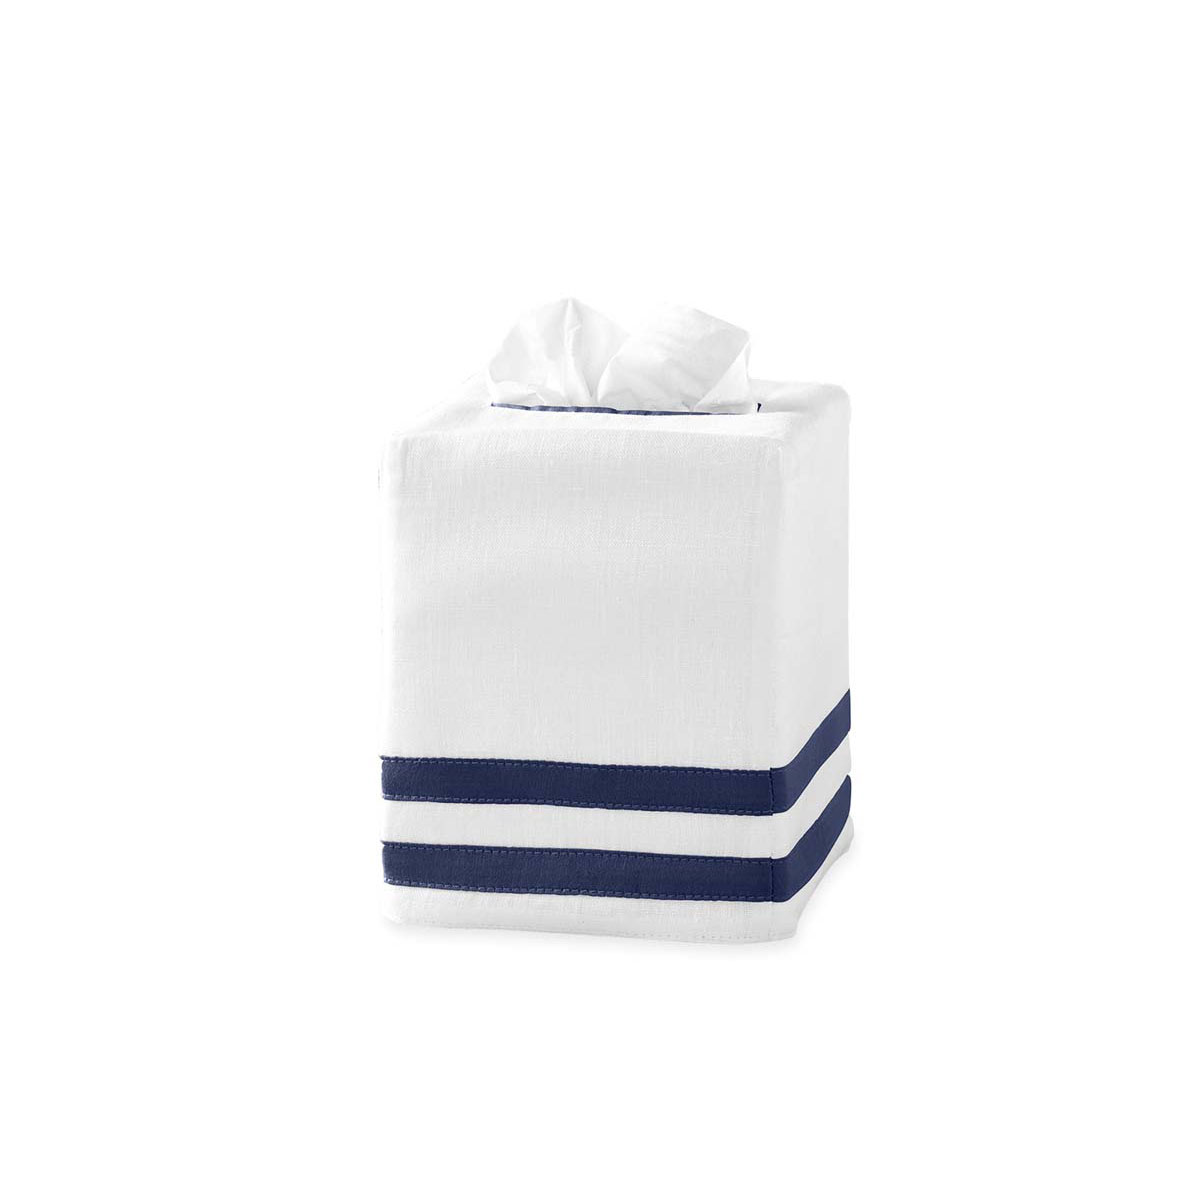 Matouk Allegro Tissue Box Cover